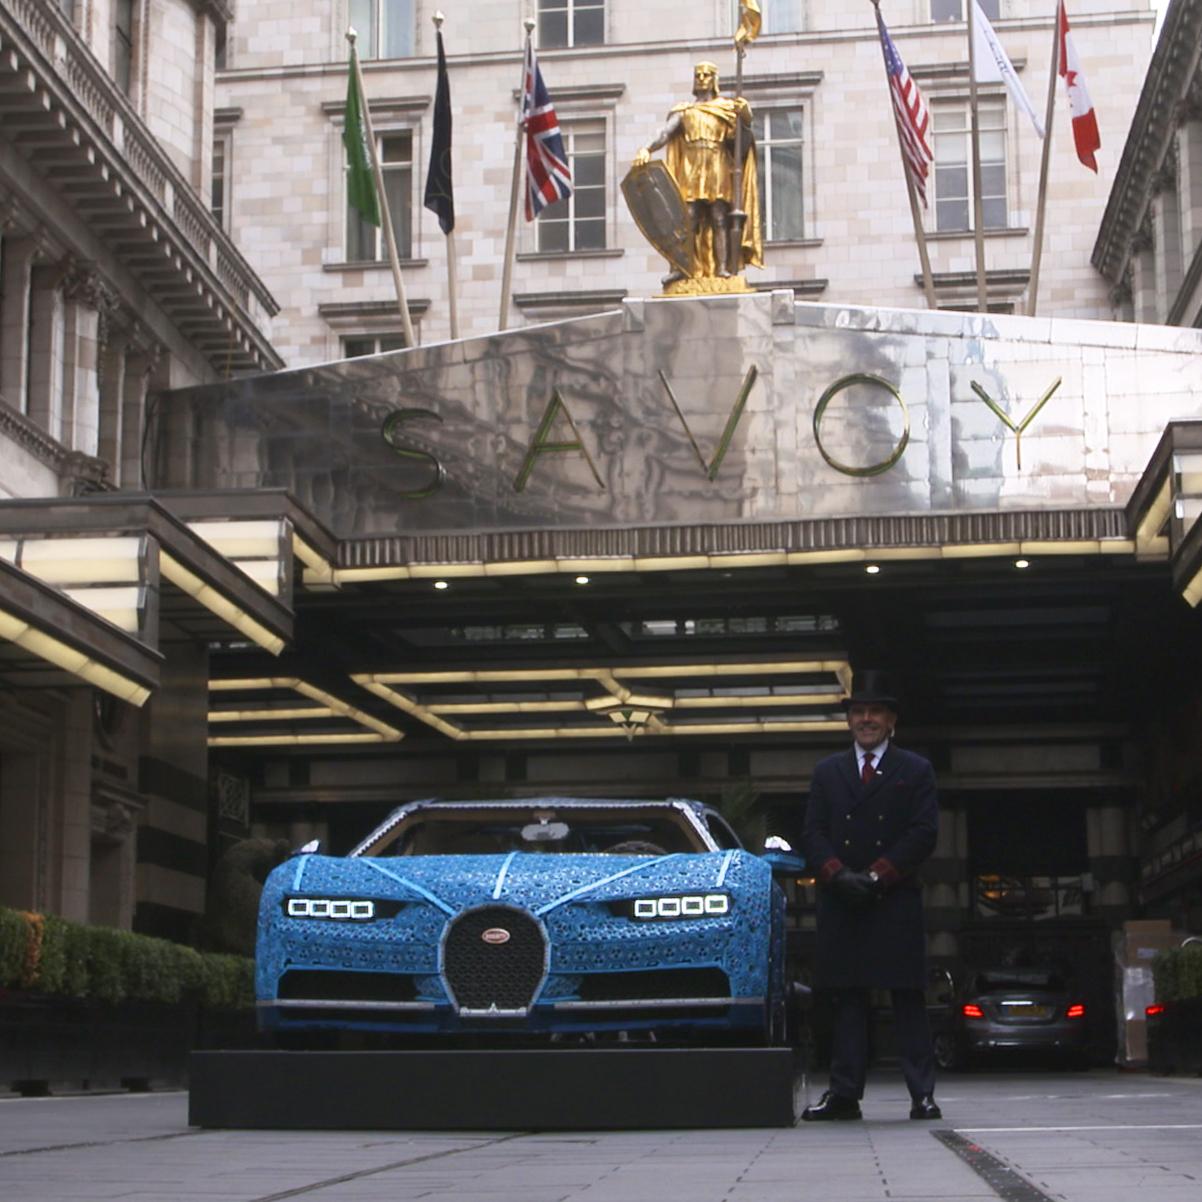 LEGO Technic Bugatti UK tour